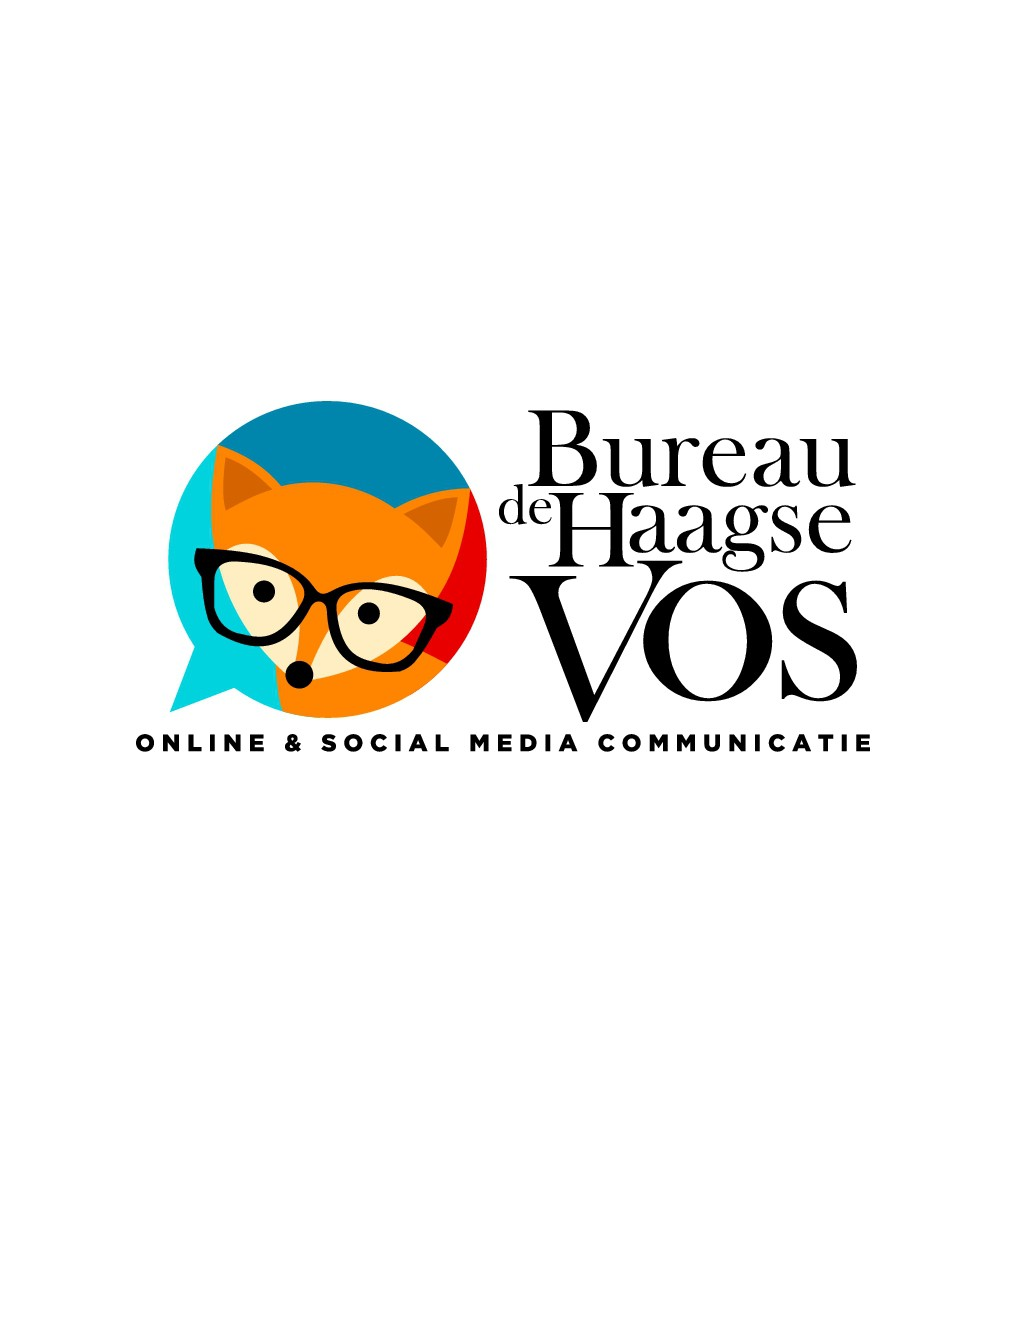 Create a smart and sassy logo for a social media fanatic